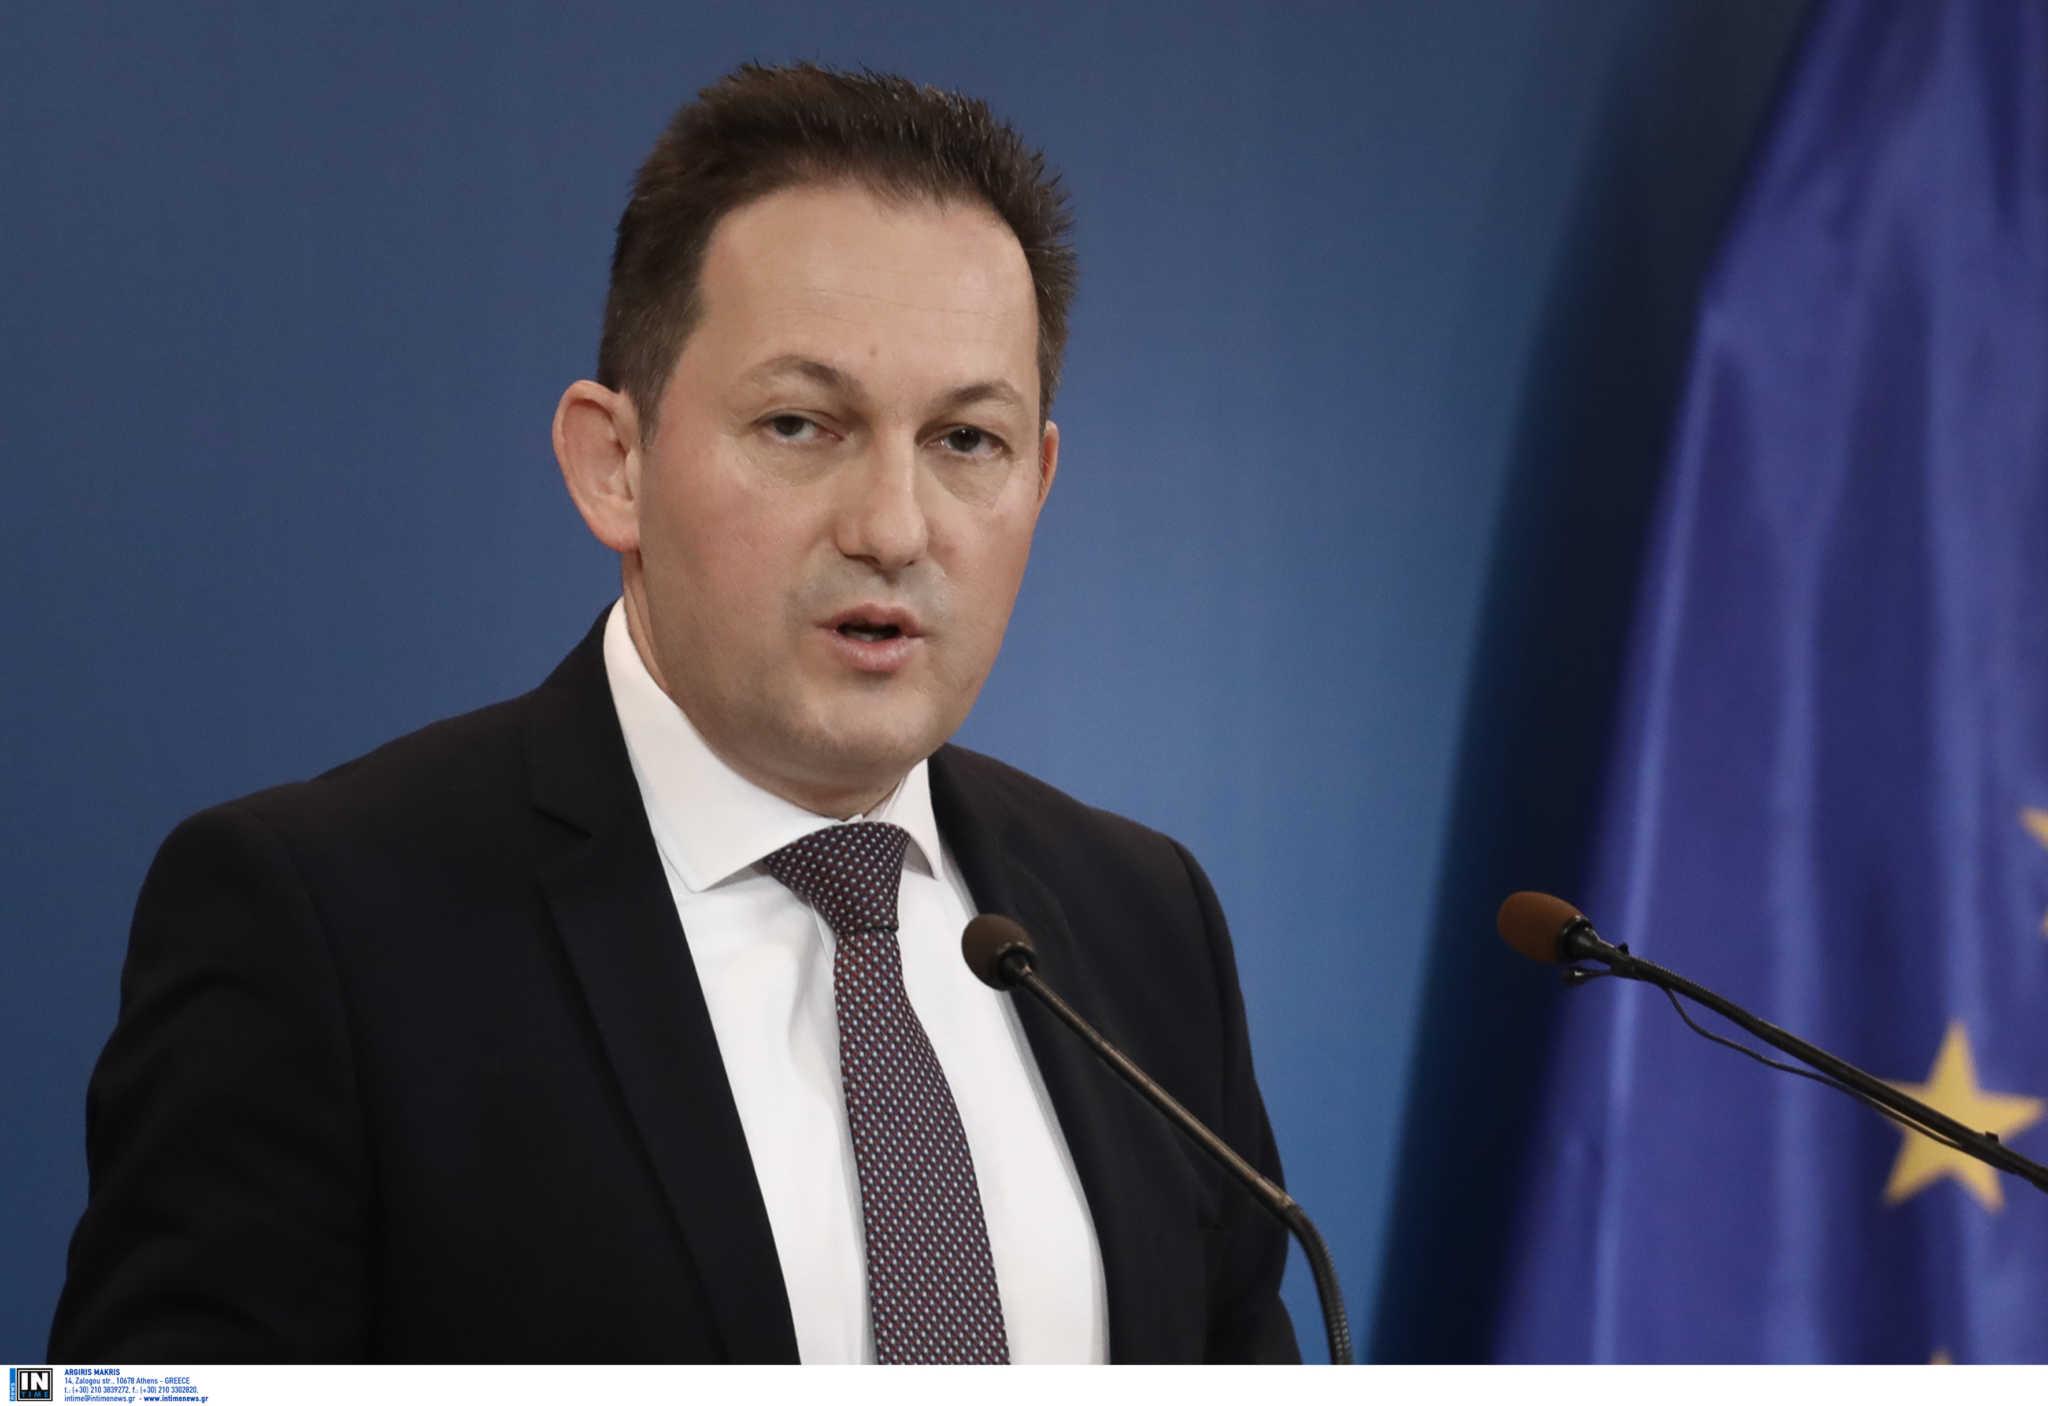 "Mήνυμα Πέτσα προς Μητροπολίτη Σερβίων & Κοζάνης: ""Όλοι μας -επαναλαμβάνω: όλοι μας- πρέπει να τηρούμε τις συστάσεις των ειδικών"""